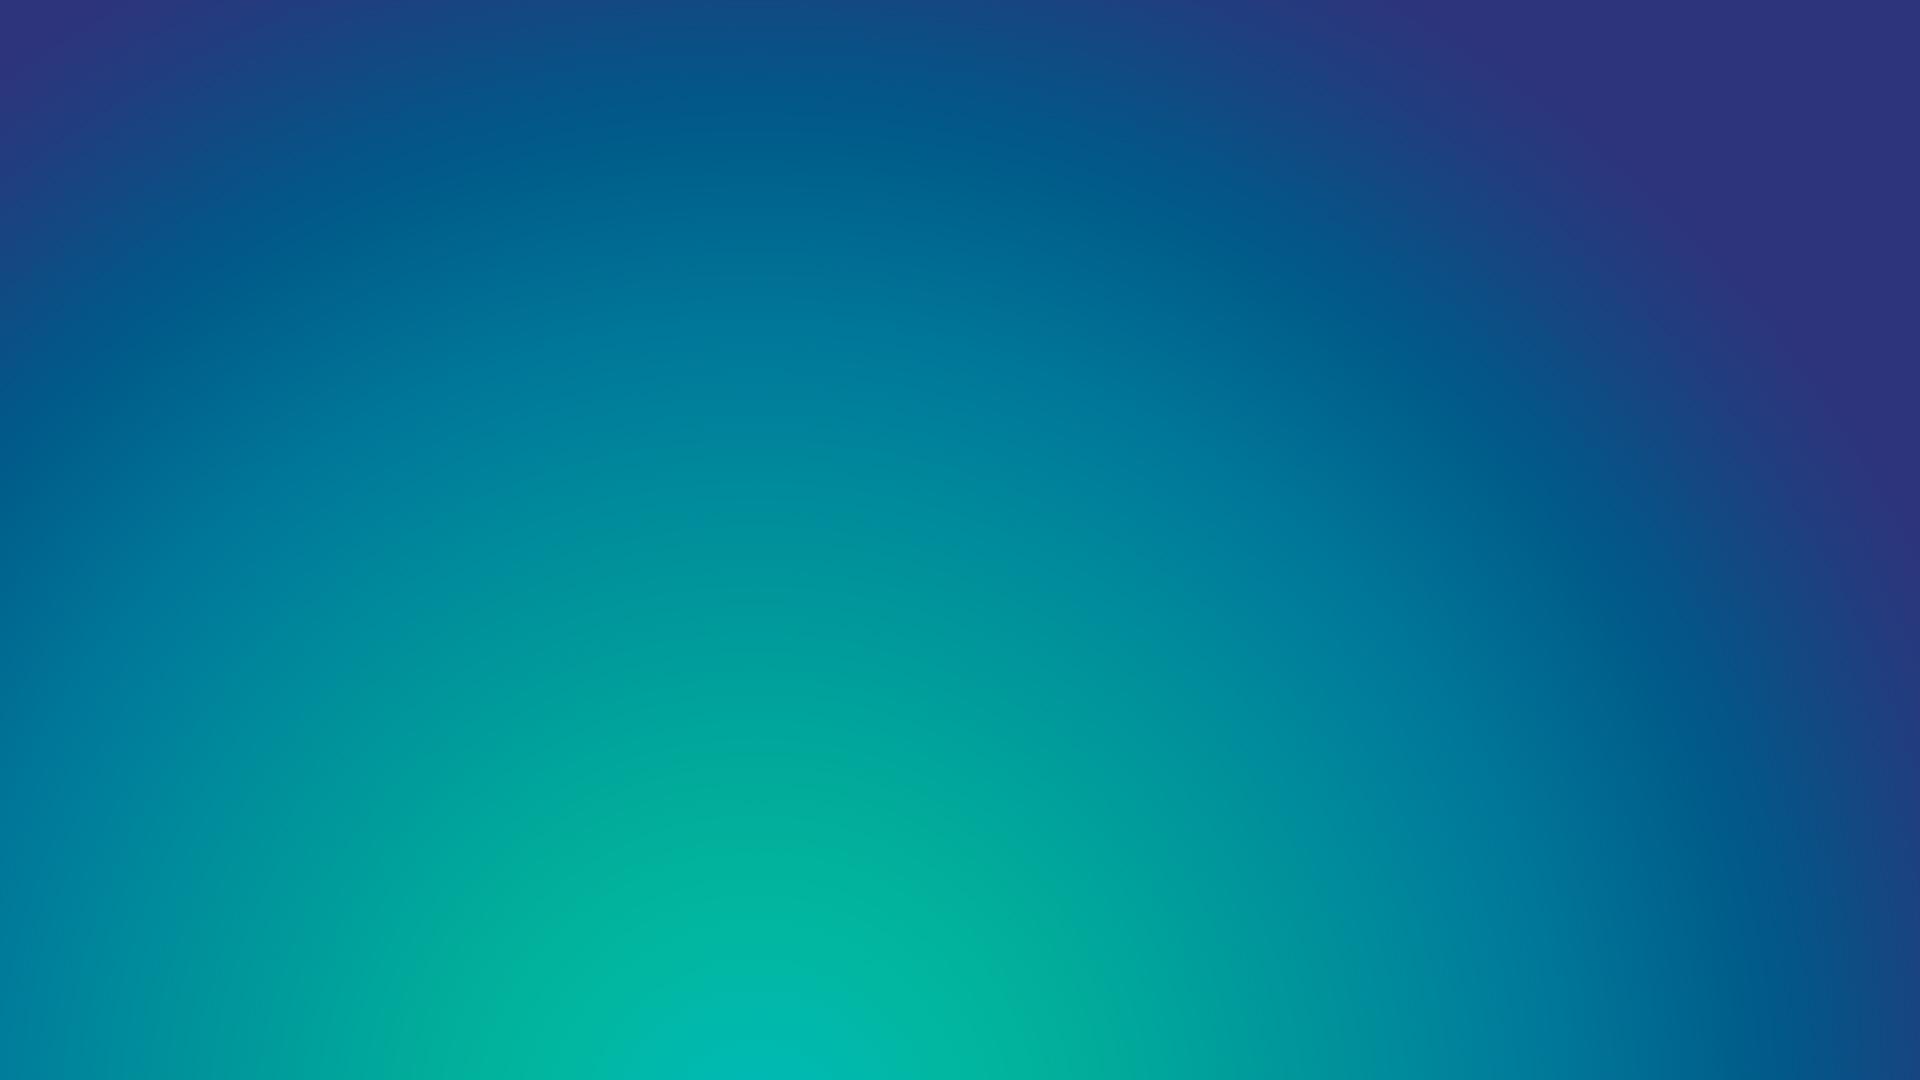 Background_dégradé_bleu